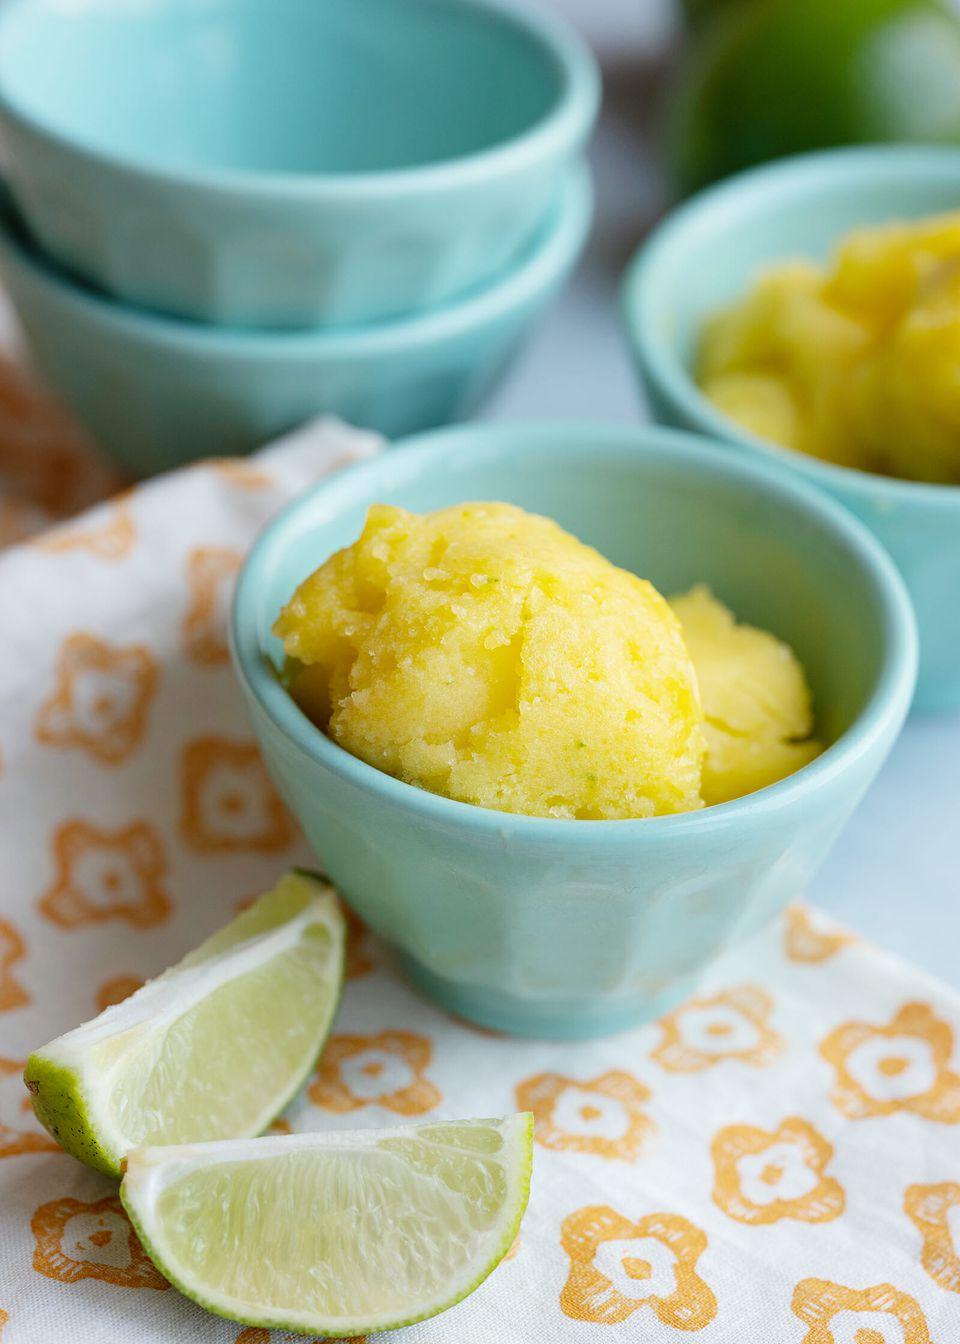 Mango sorbet with frozen mangos